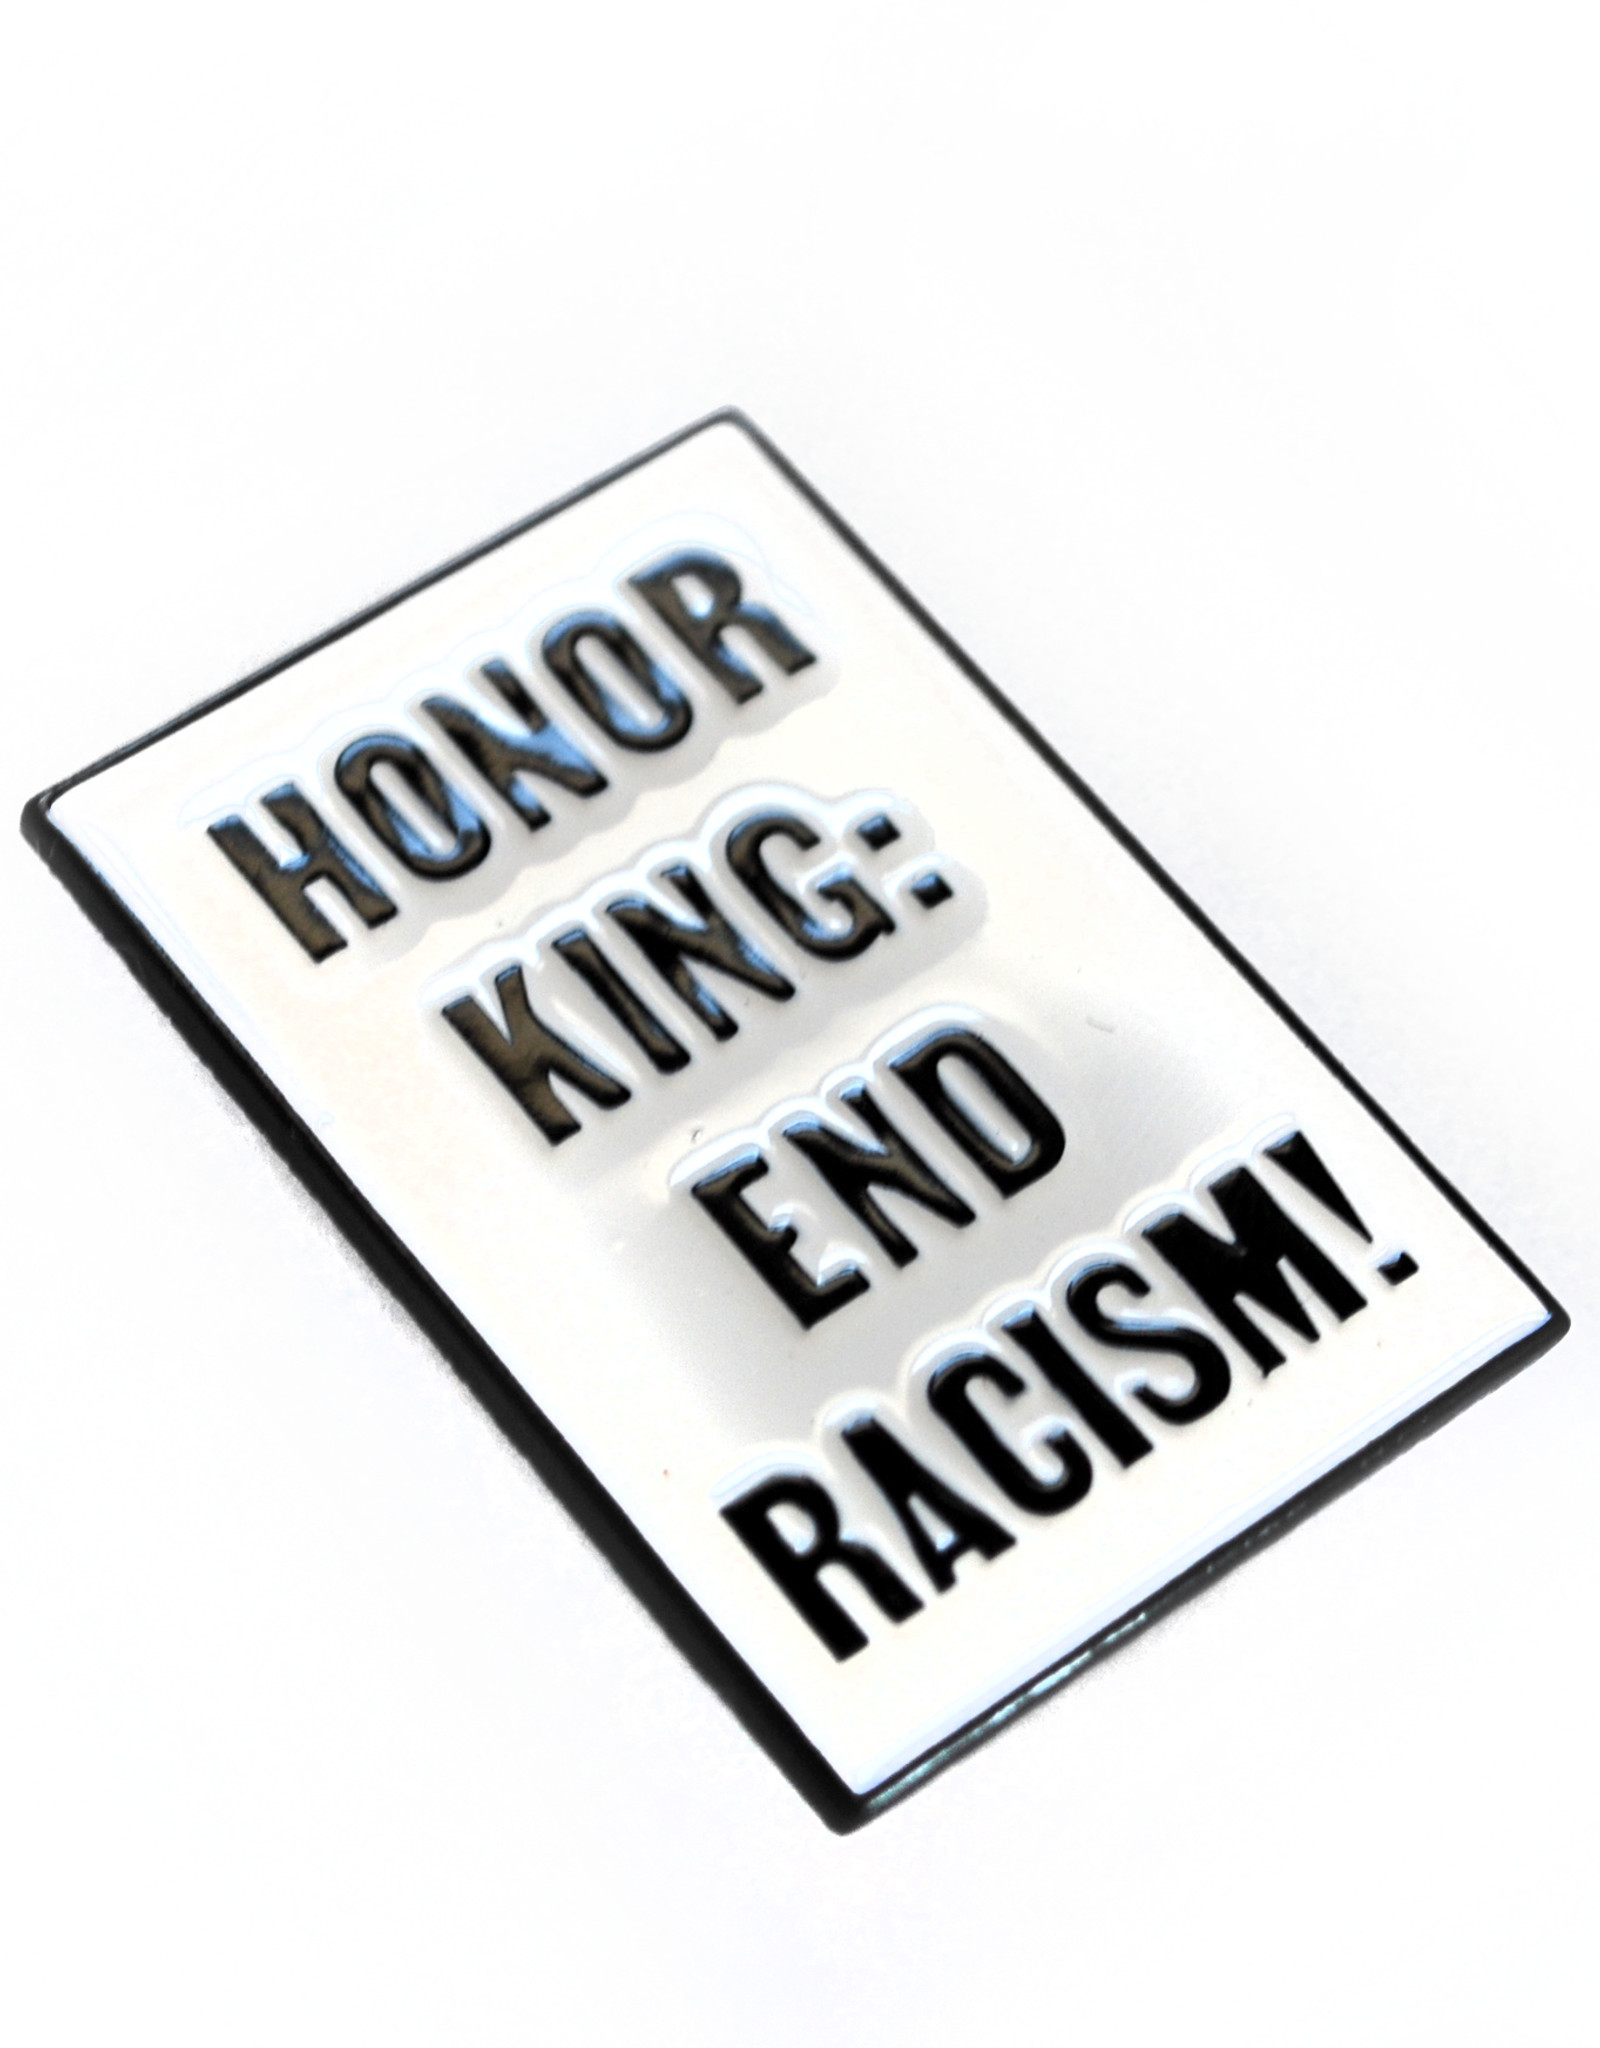 ReformedSchool Honor King Enamel Pin by ReformedSchool